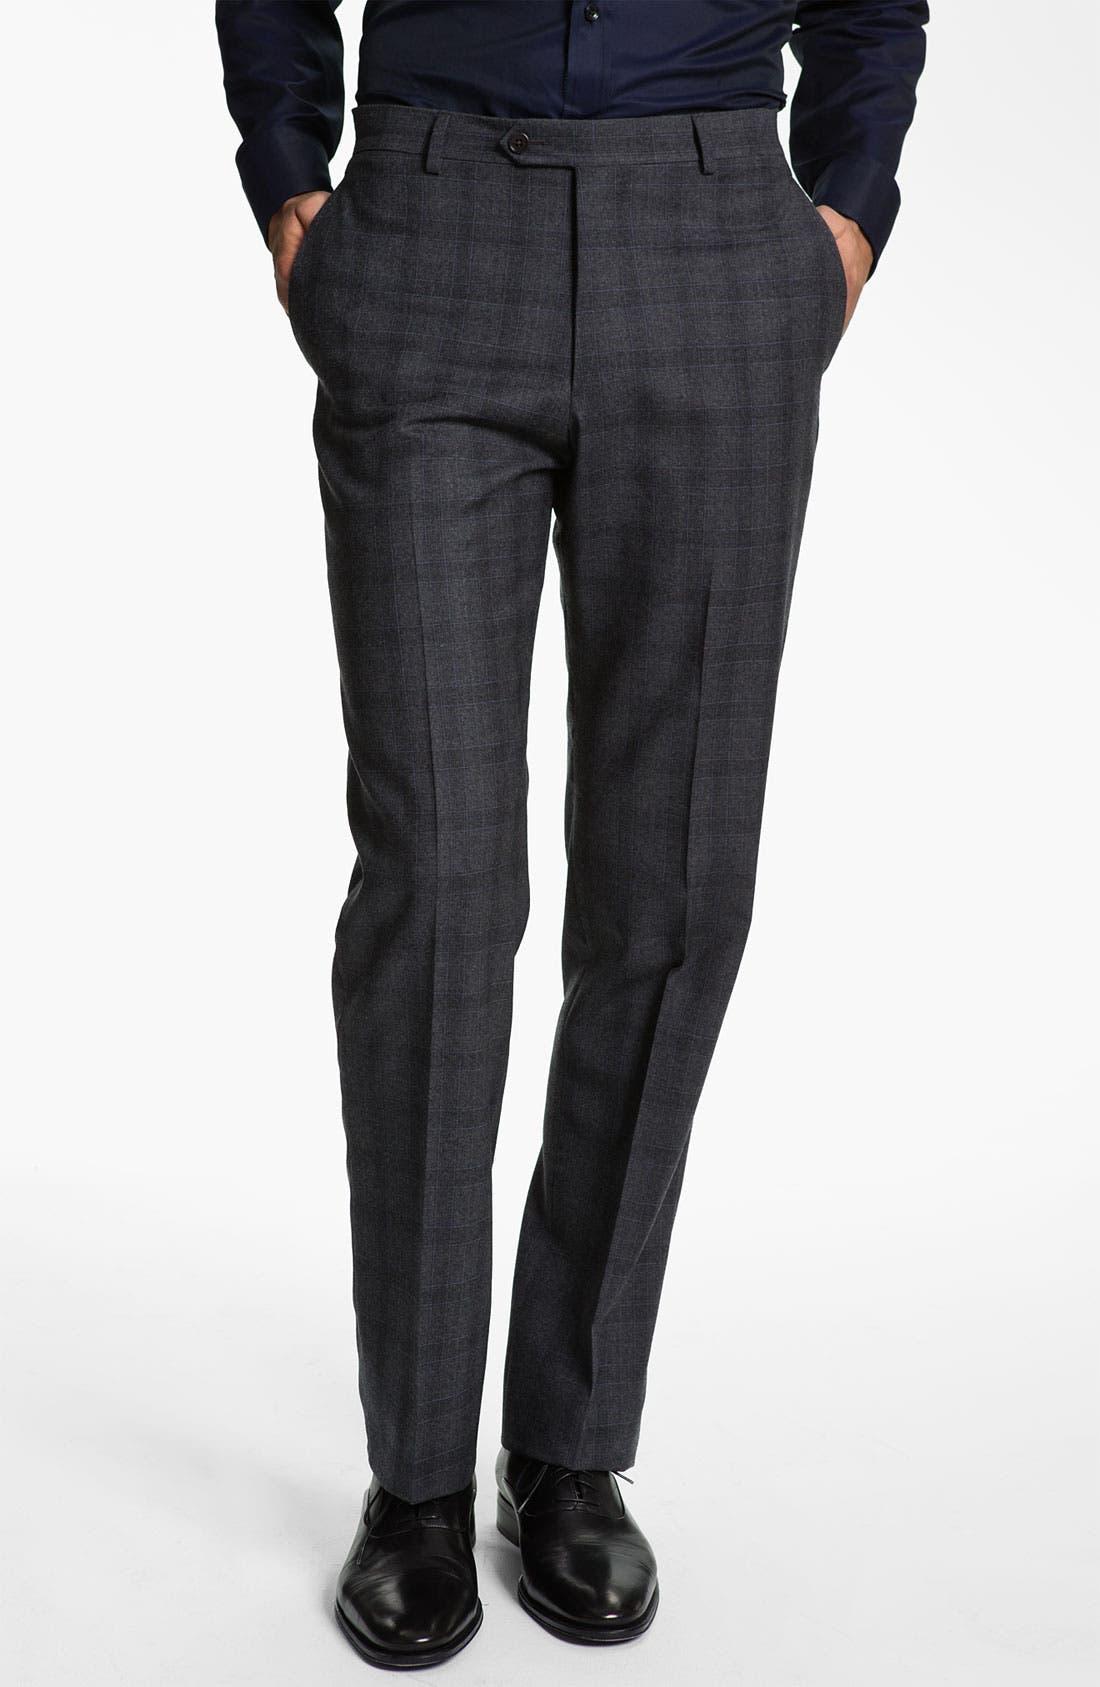 Alternate Image 1 Selected - Armani Collezioni Plaid Print Wool Trousers